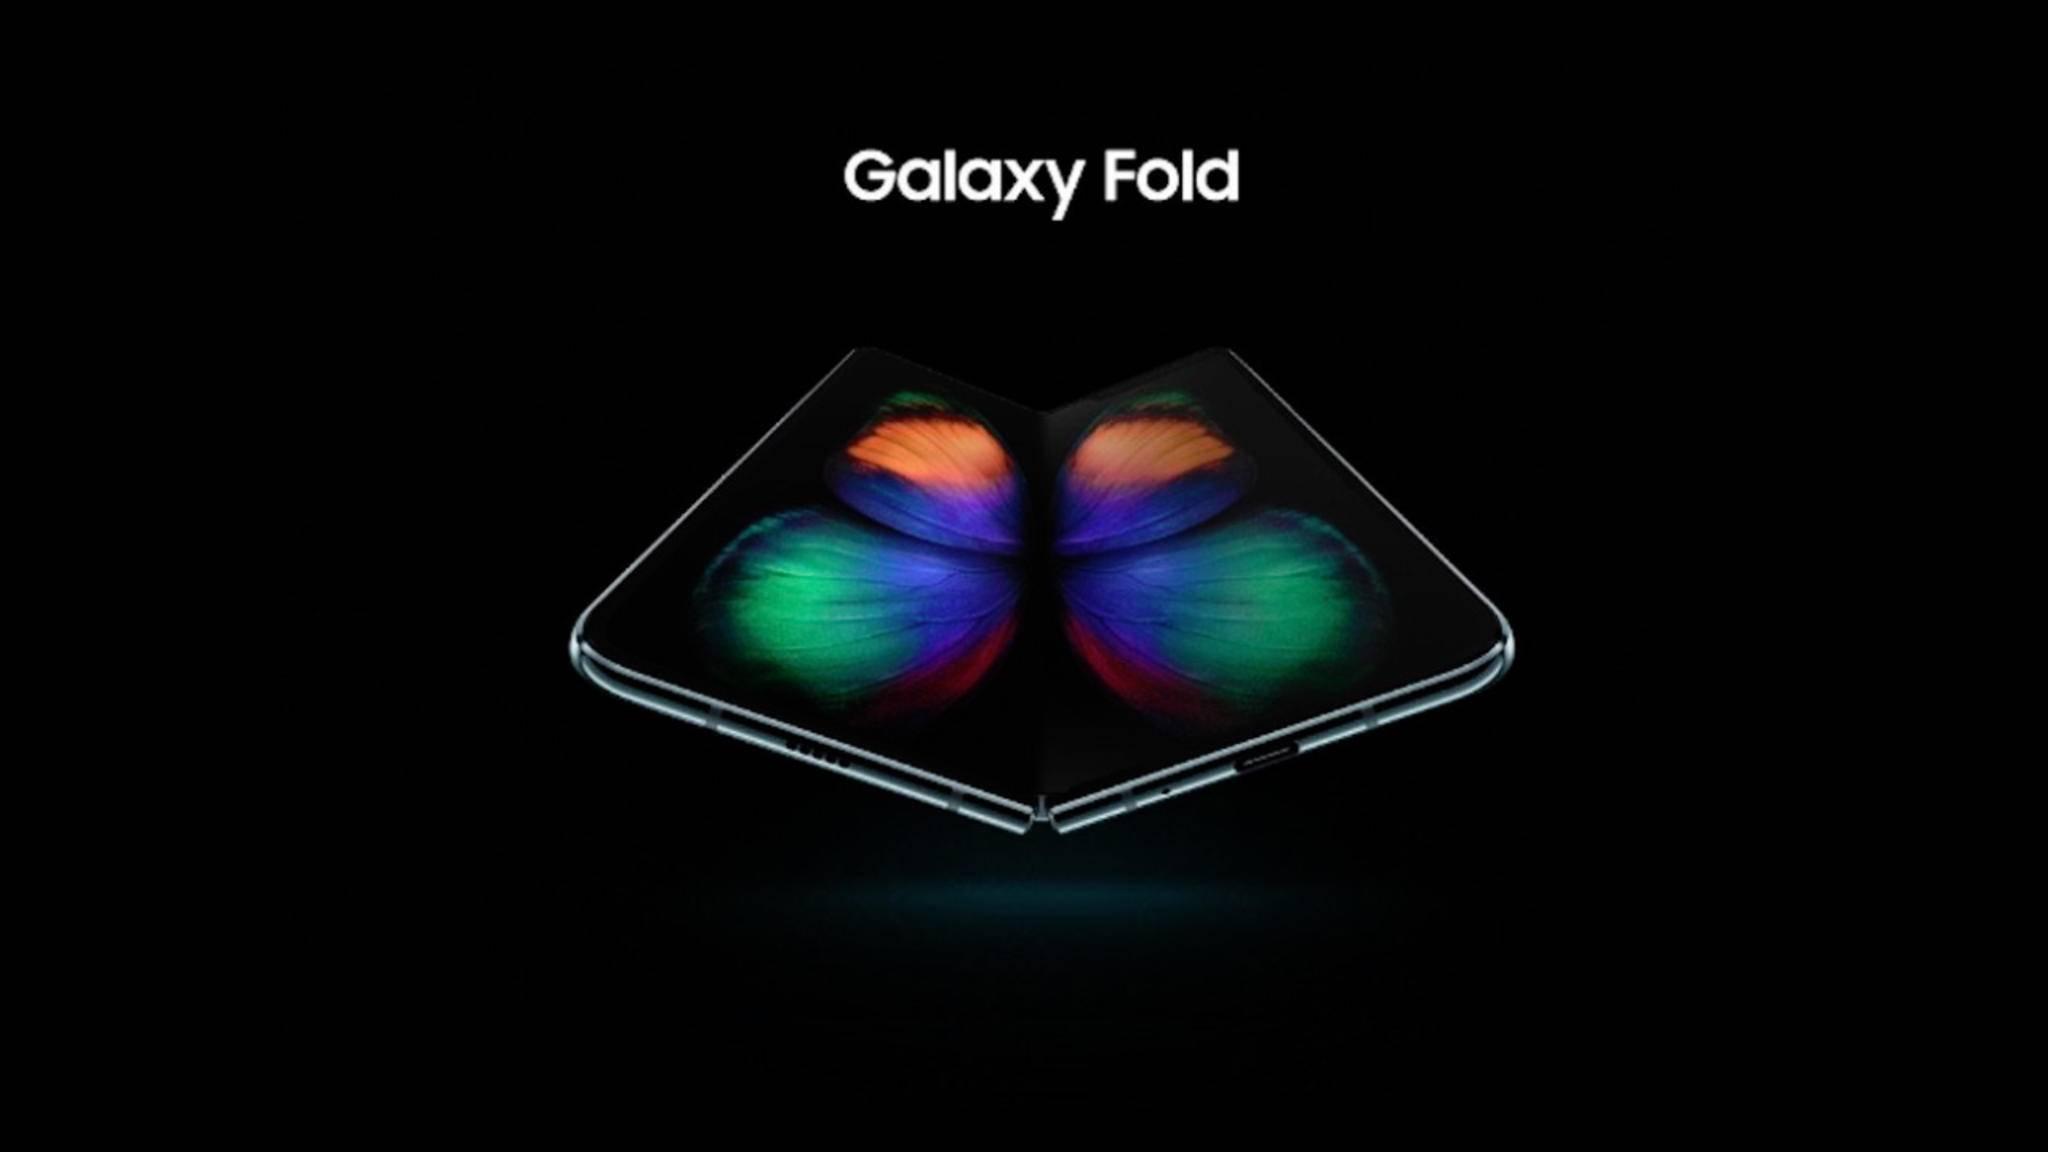 Das Galaxy Fold hat einen faltbaren Screen.